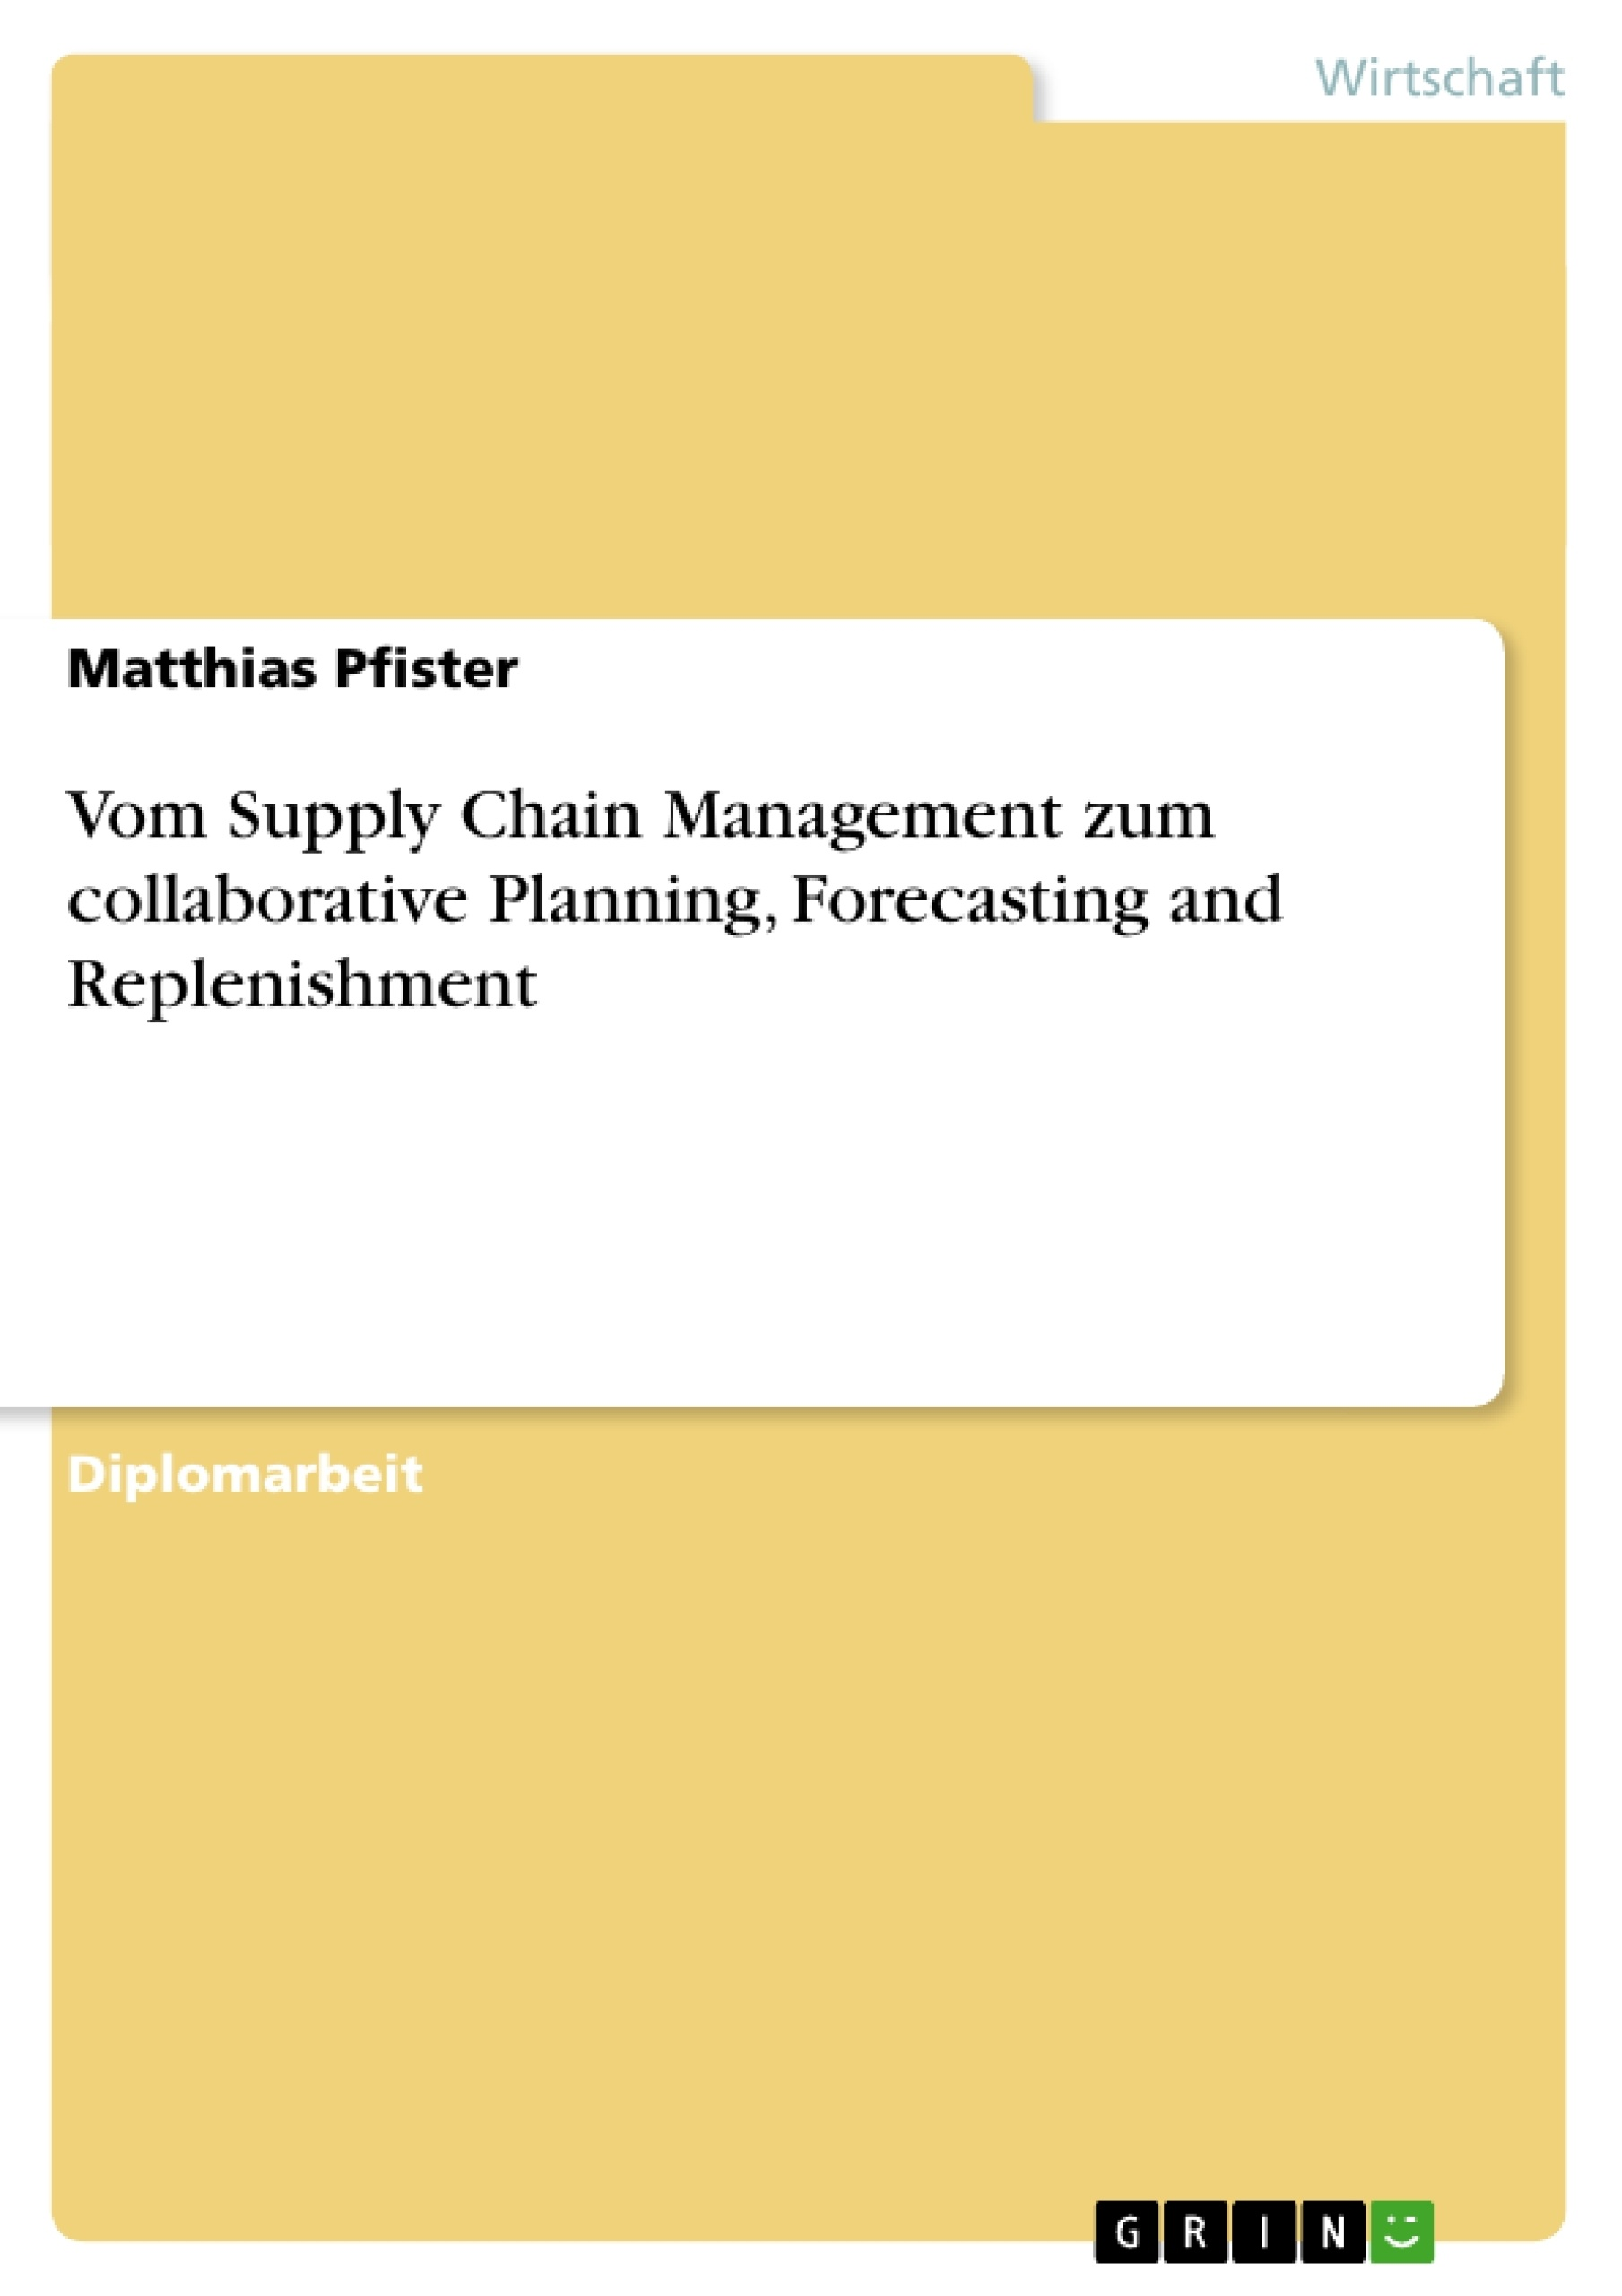 Titel: Vom Supply Chain Management zum collaborative Planning, Forecasting and Replenishment